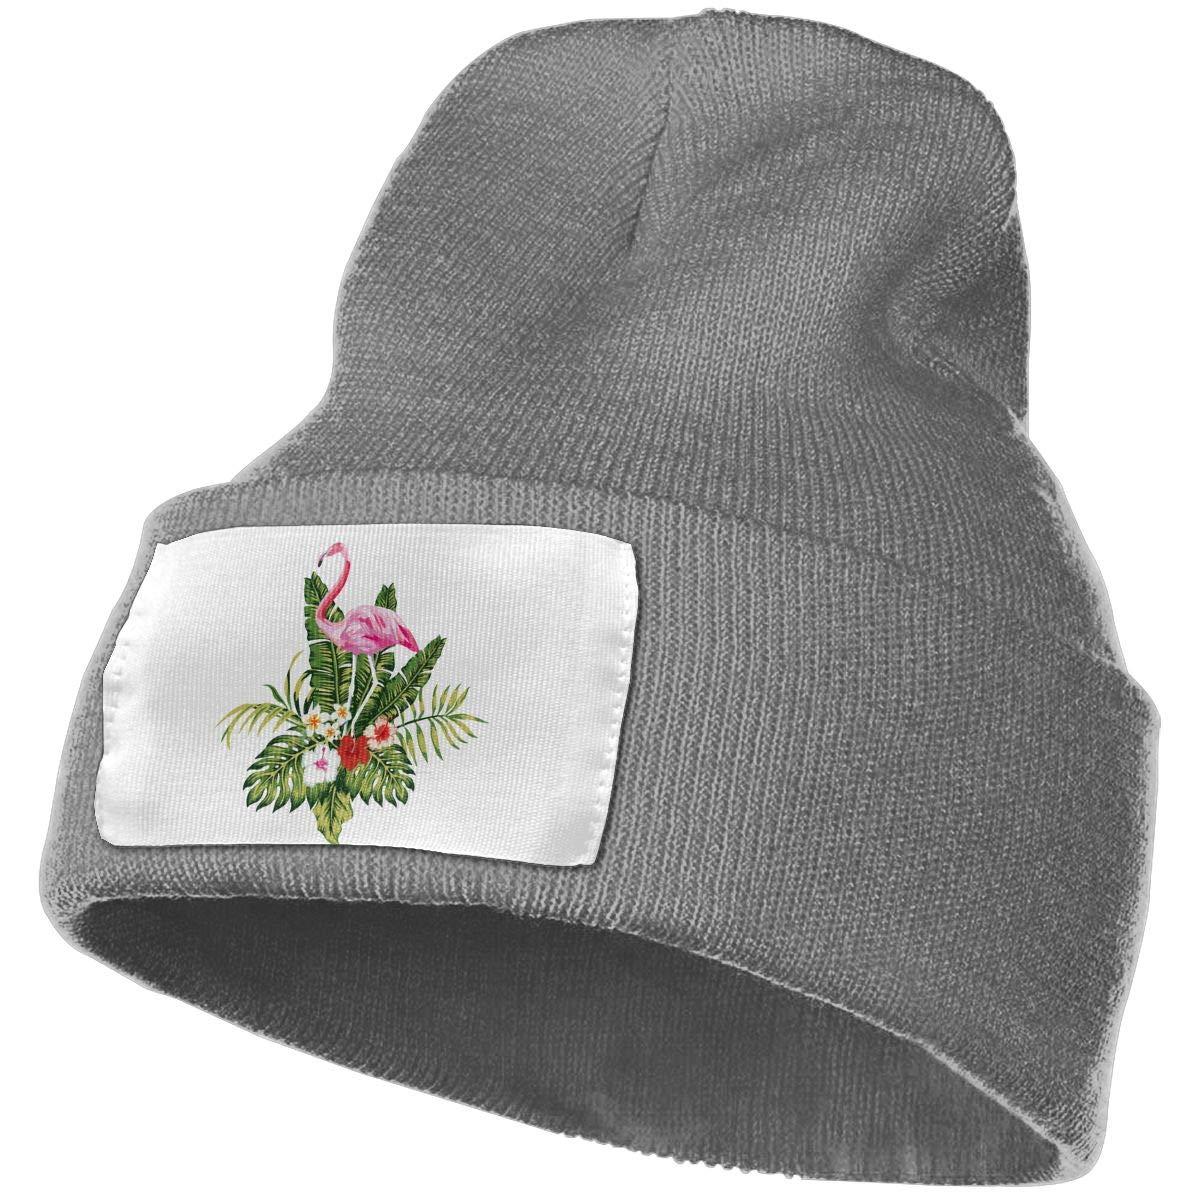 Pink Flamingos Birds Men /& Women Skull Caps Winter Warm Stretchy Knit Beanie Hats